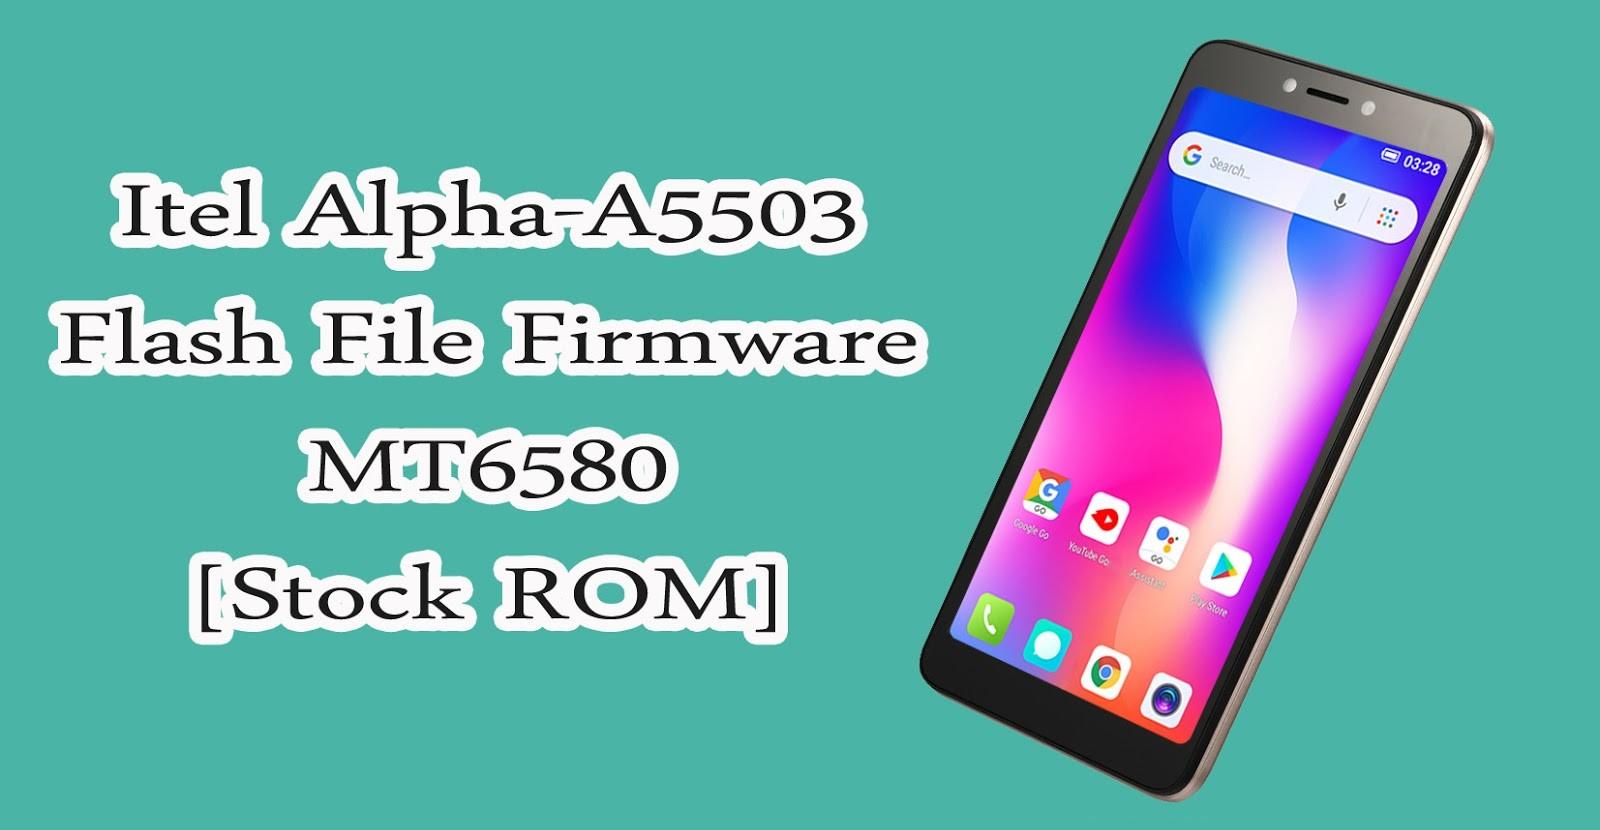 GSM FLASH FILE 25: Itel Alpha-A5503 Flash File Firmware